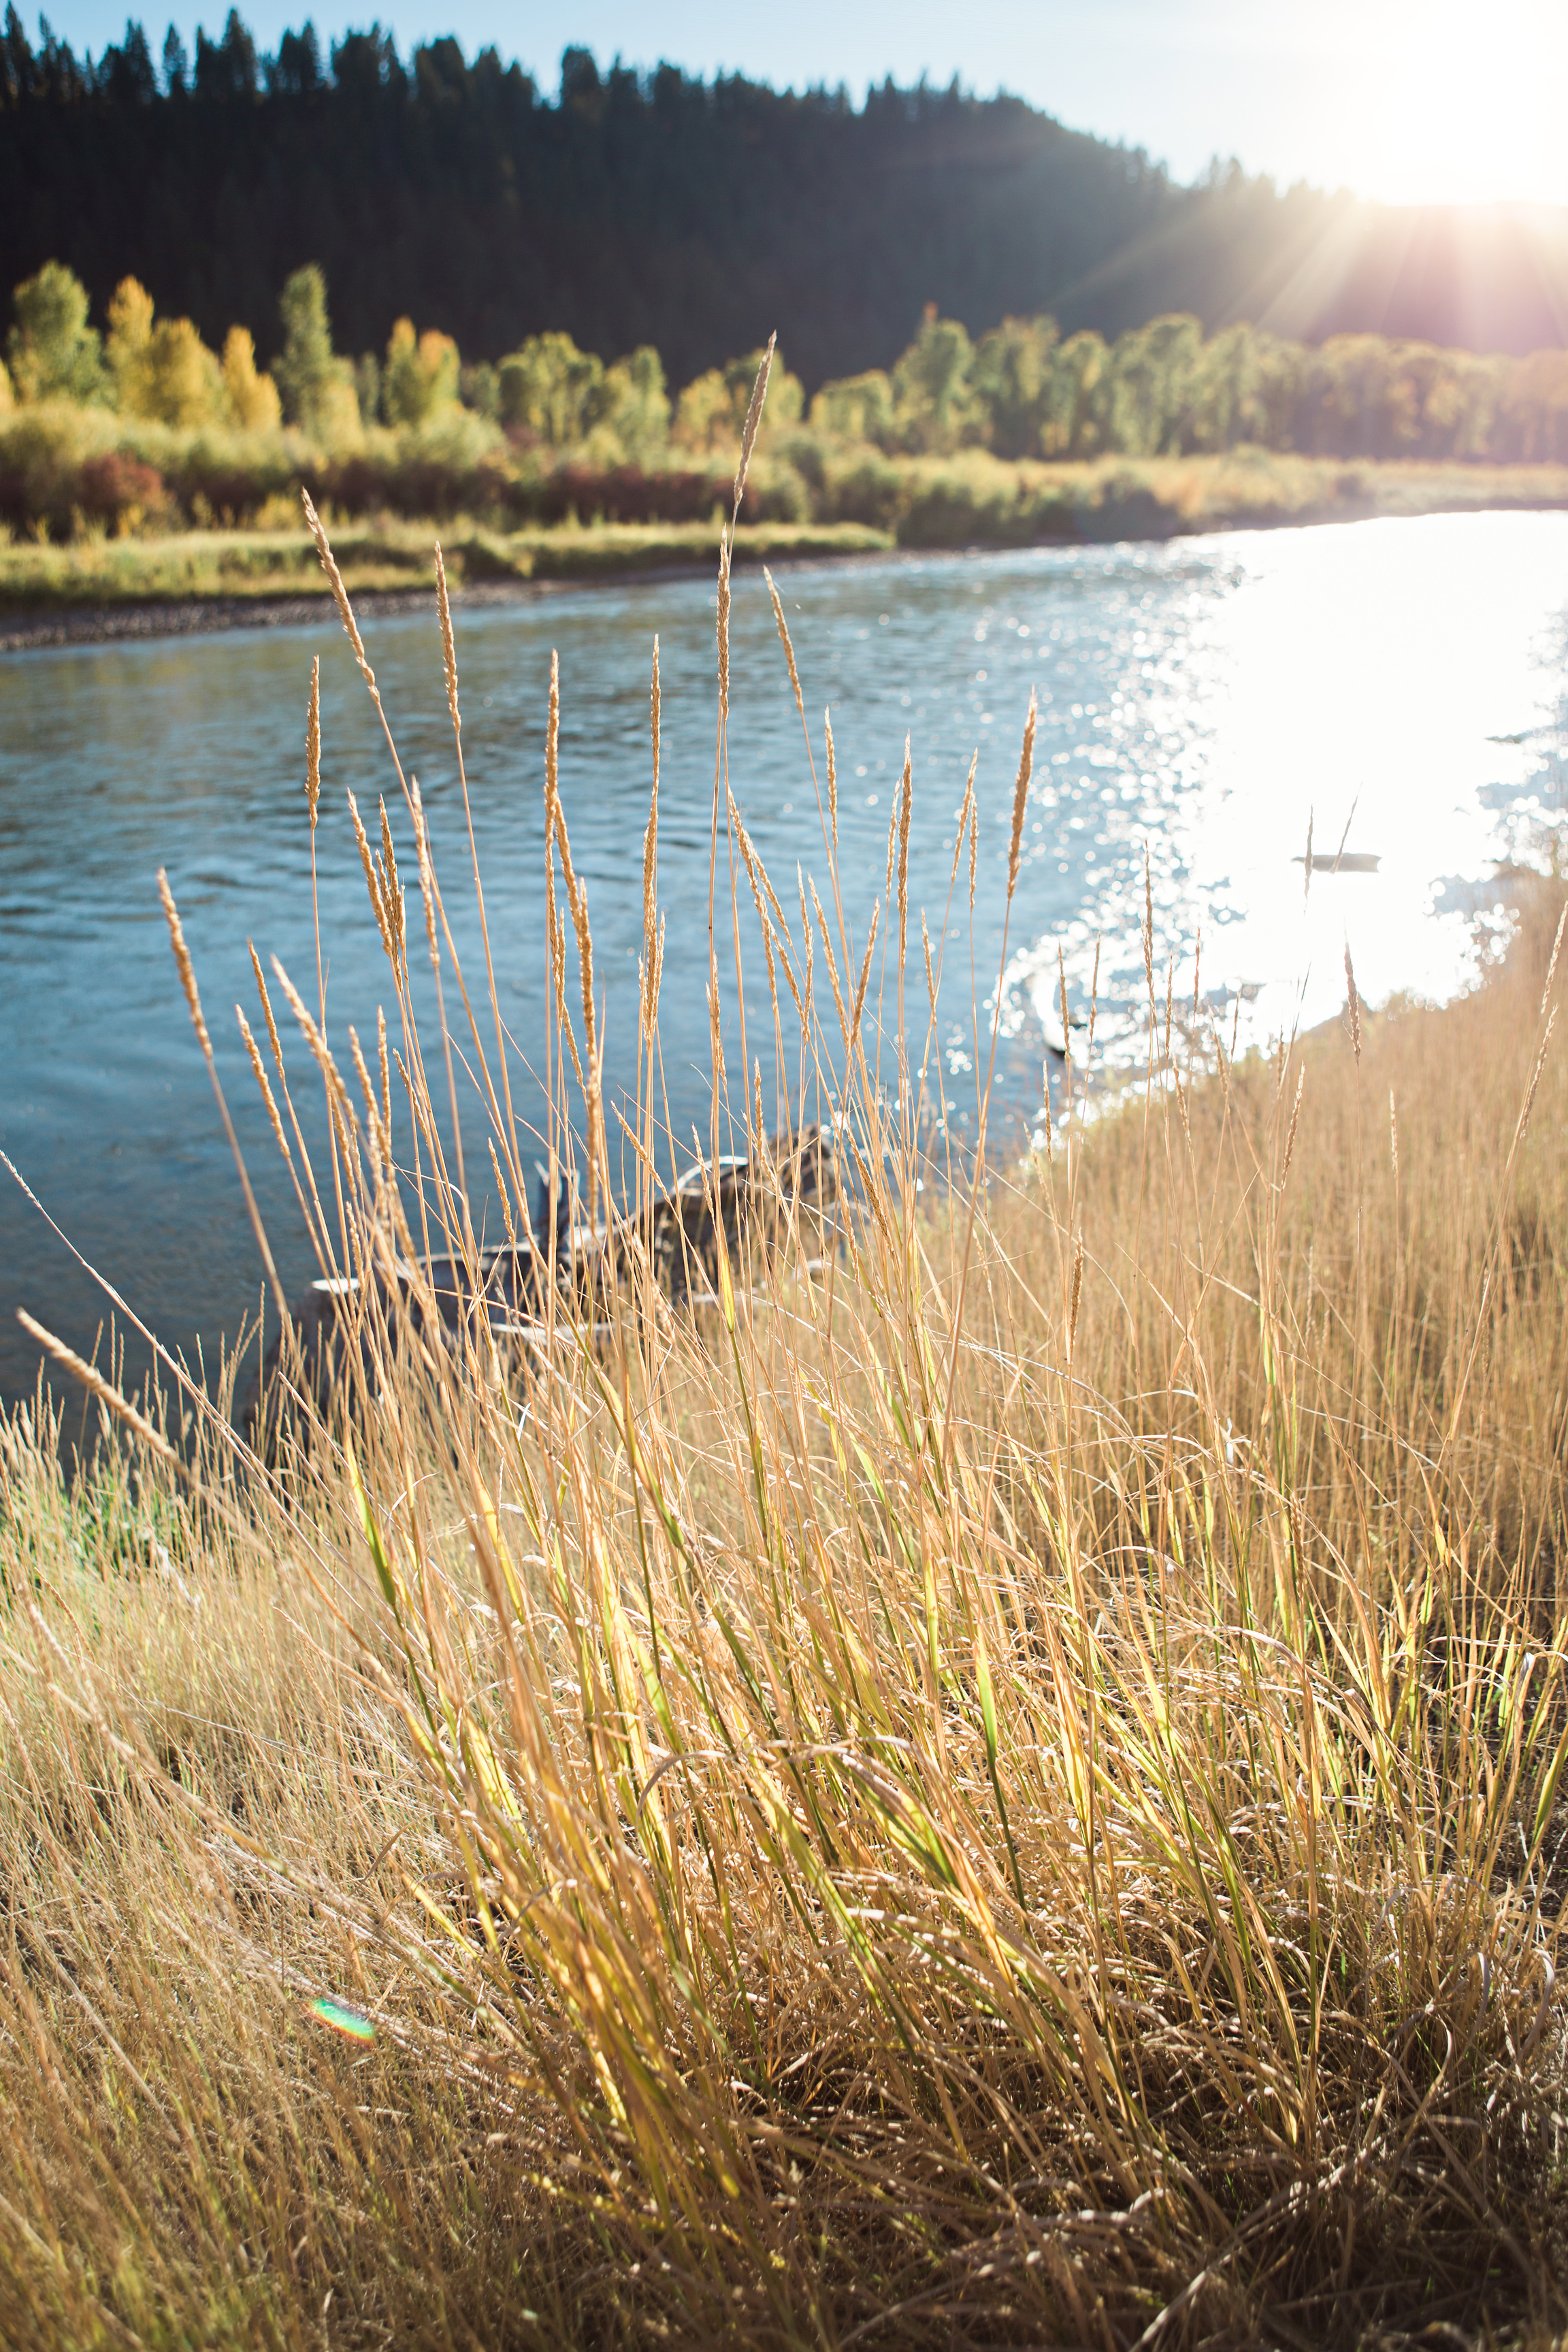 Cindy_Giovagnoli_Idaho_Wyoming_Grand_Teton_National_Park_autumn_aspens_camping_mountains-006.jpg